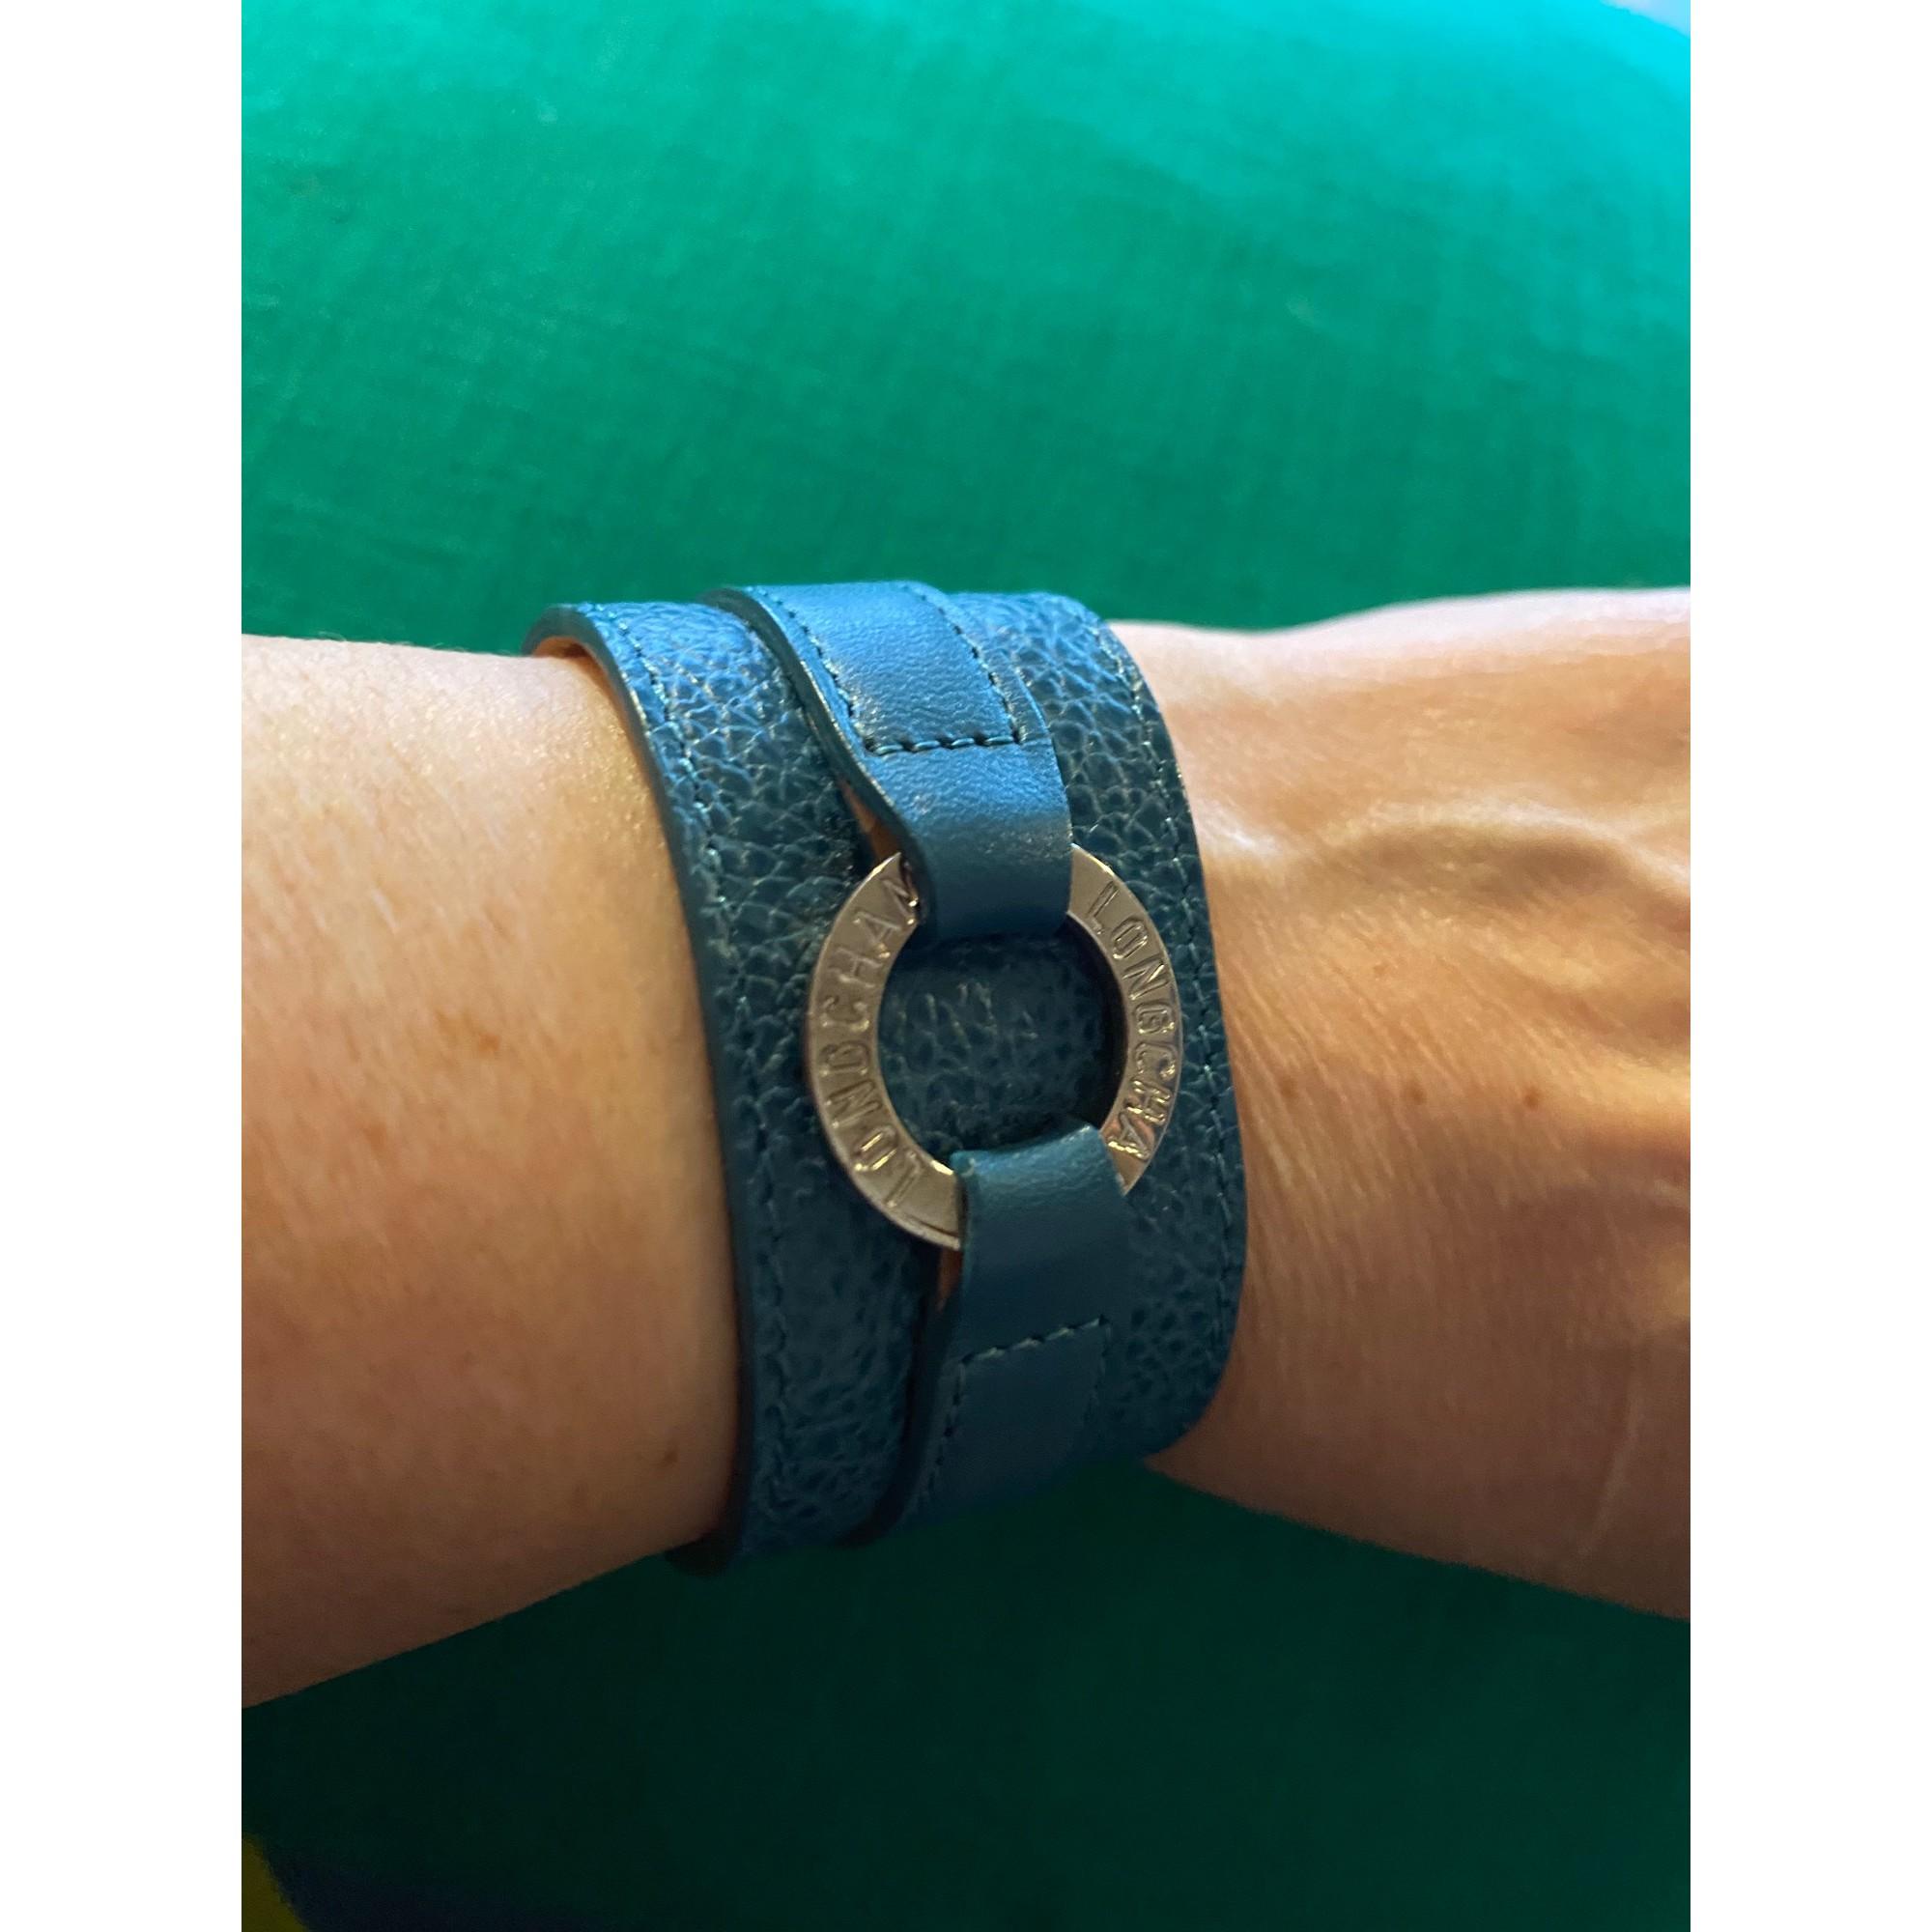 Bracelet LONGCHAMP Bleu canard turquoise